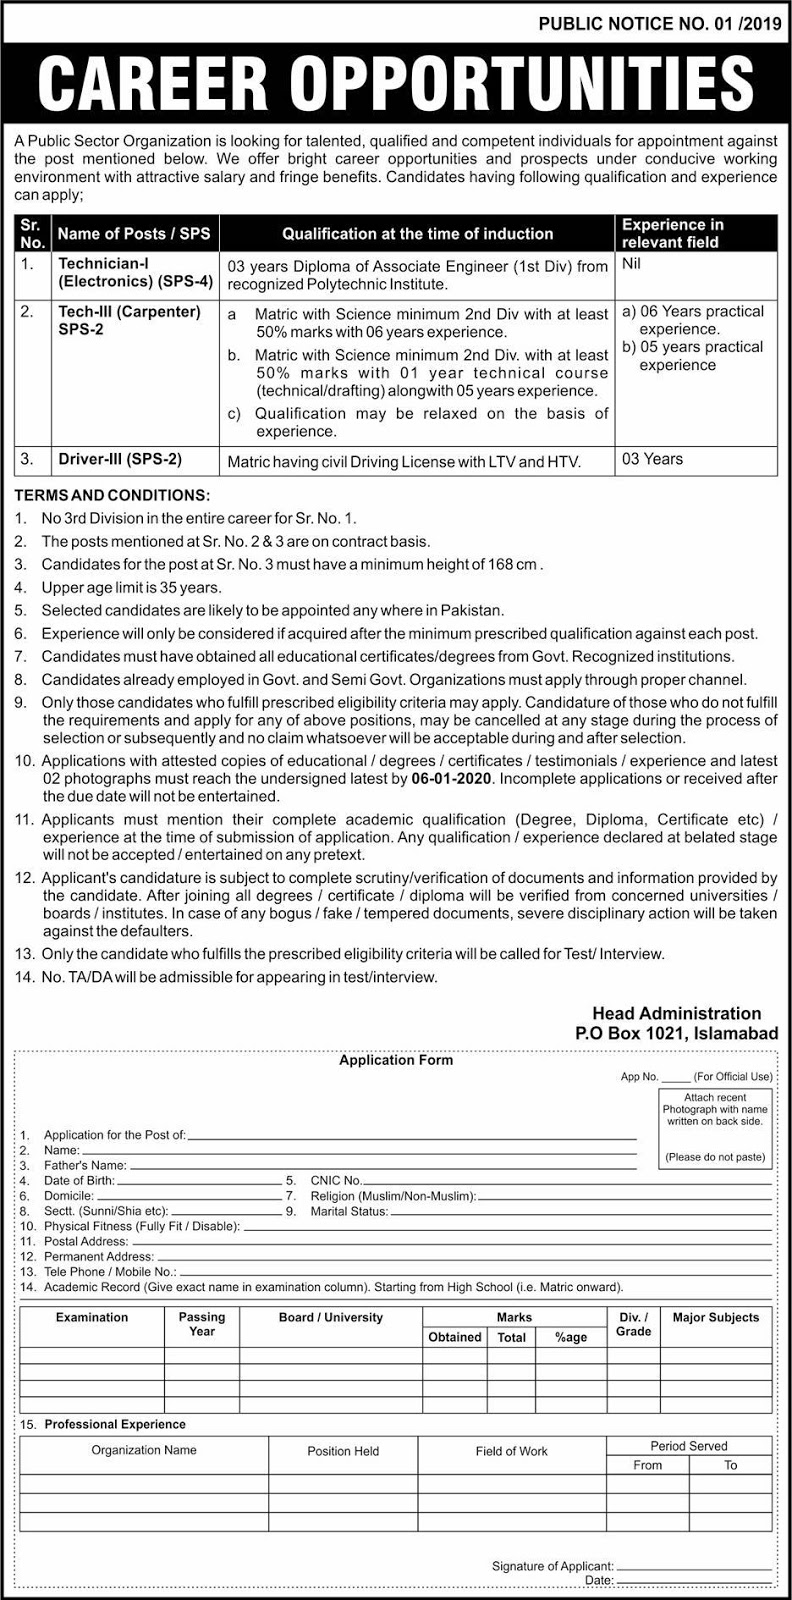 Public Sector Organization Jobs 2019 P.O.Box 1021 Islamabad